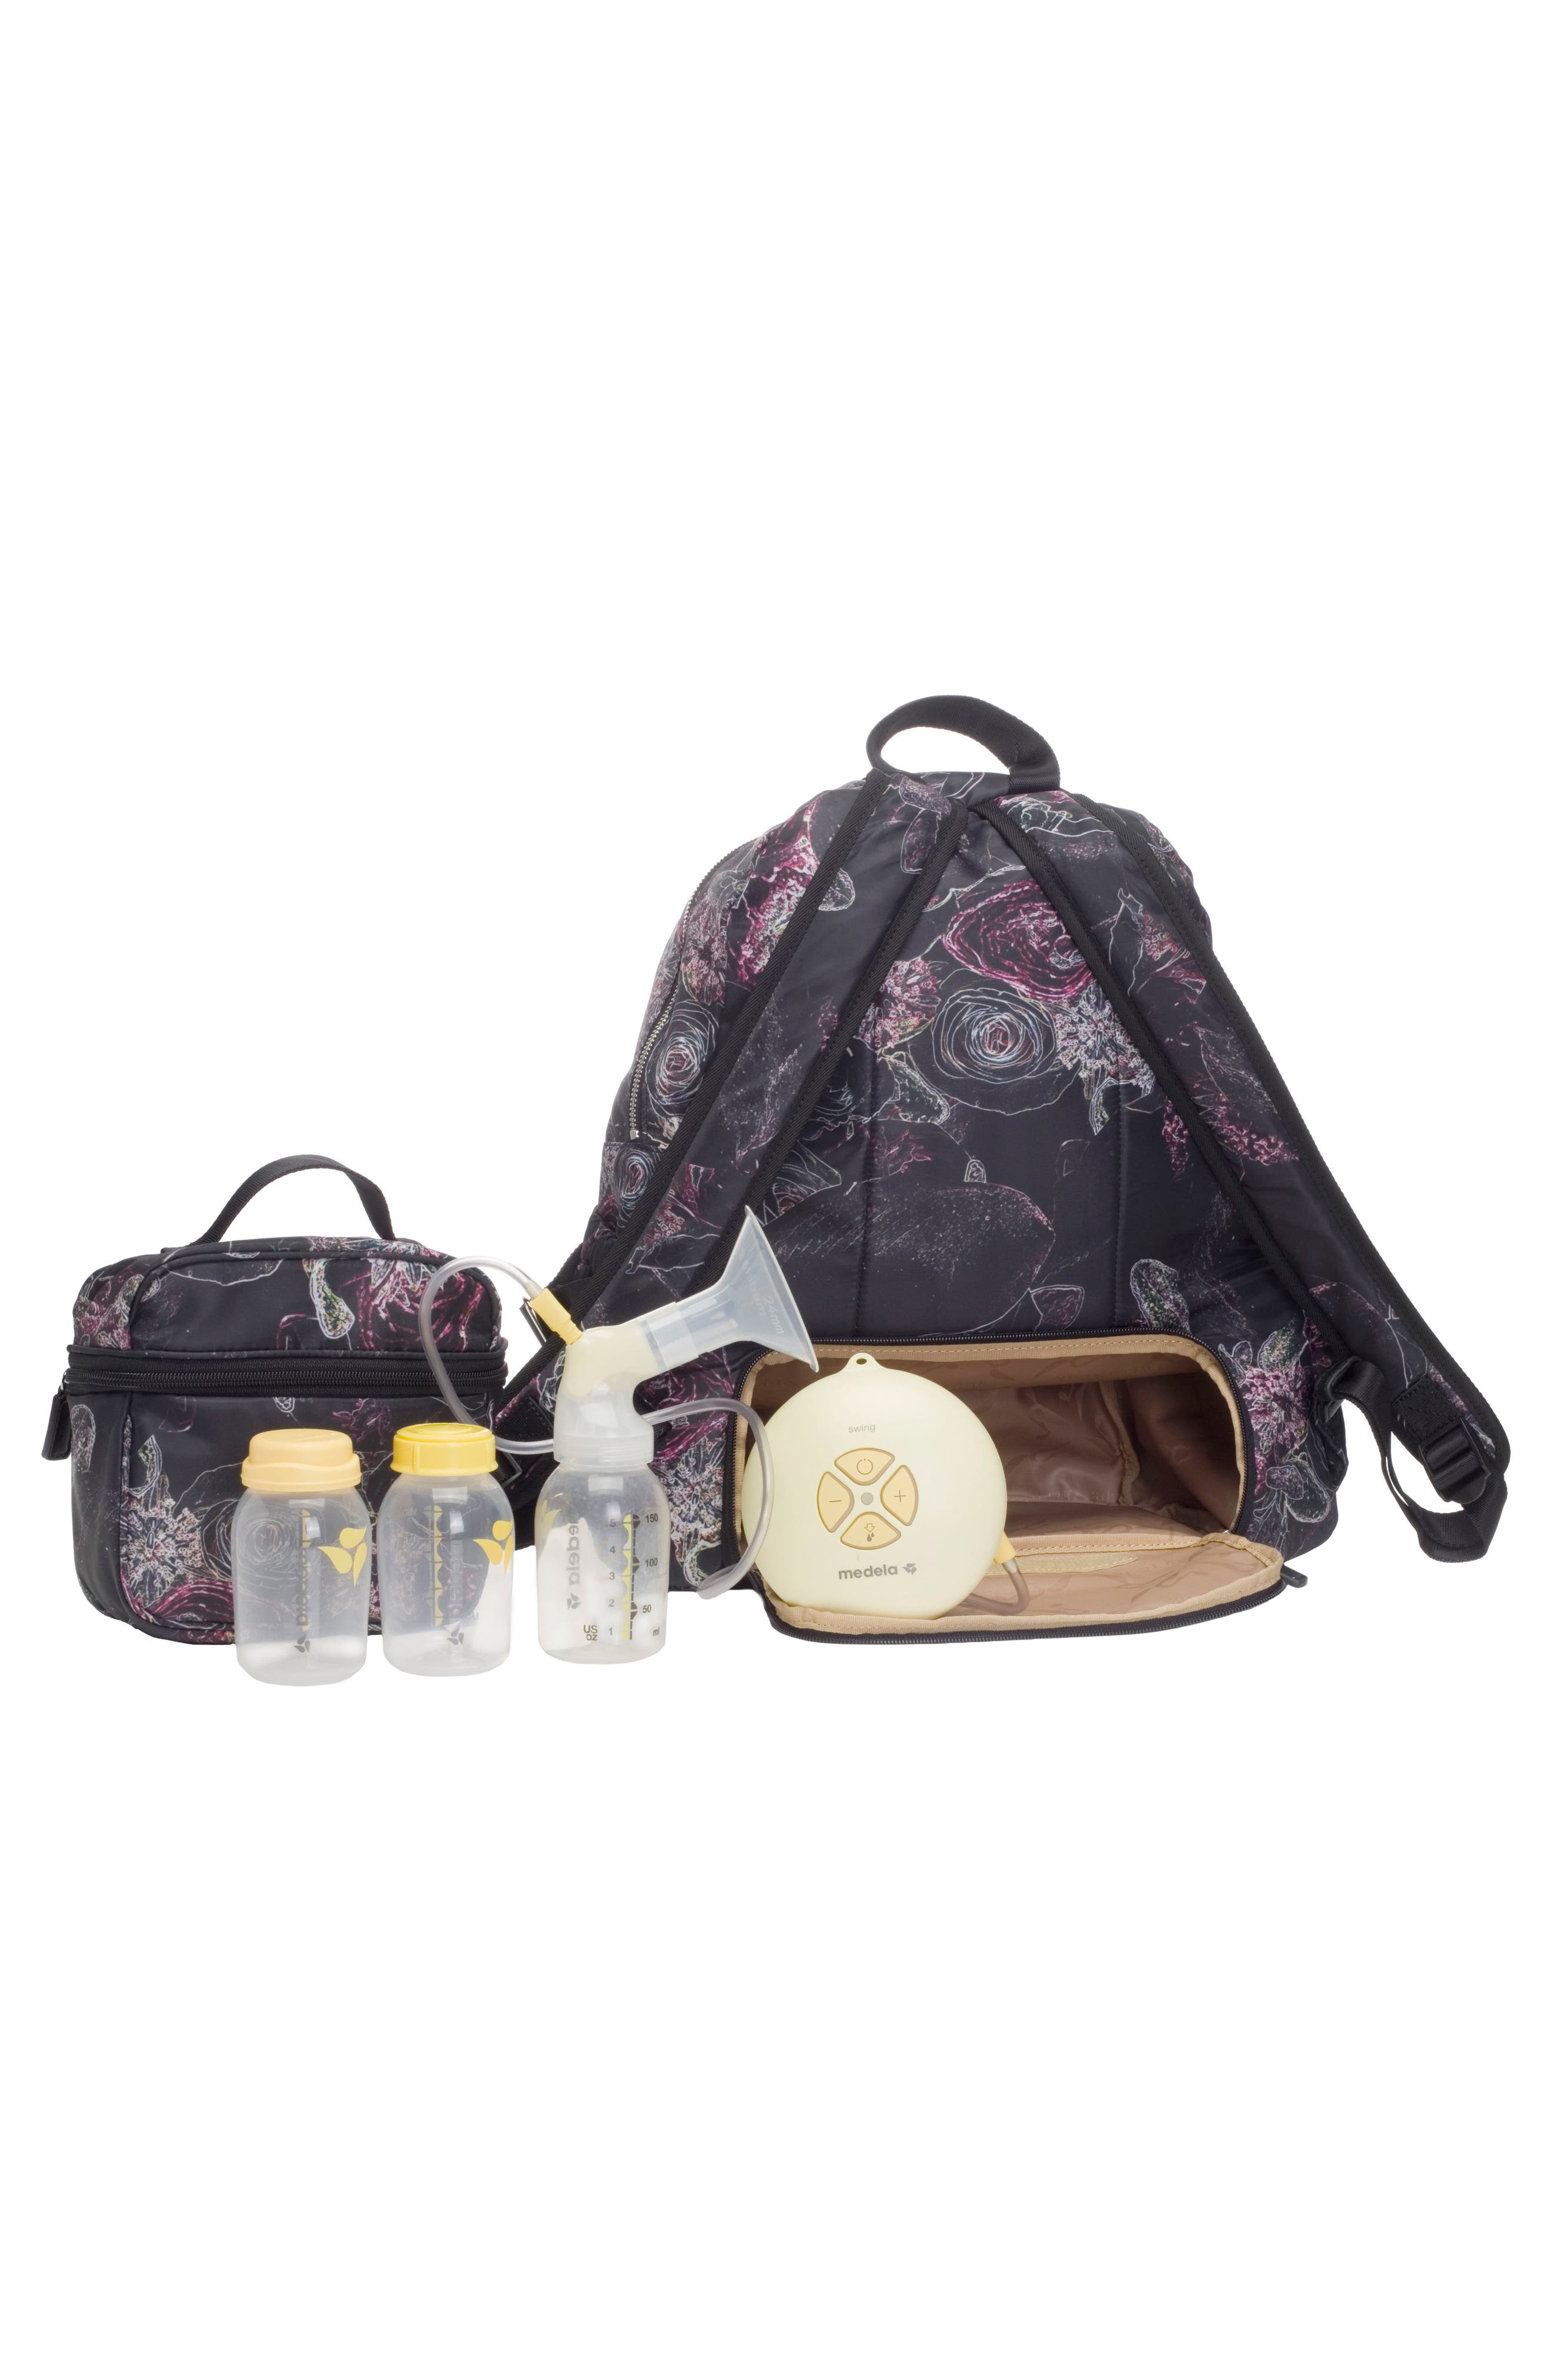 Hero Water Resistant Nylon Backpack Diaper Bag,                             Alternate thumbnail 3, color,                             Neon Floral